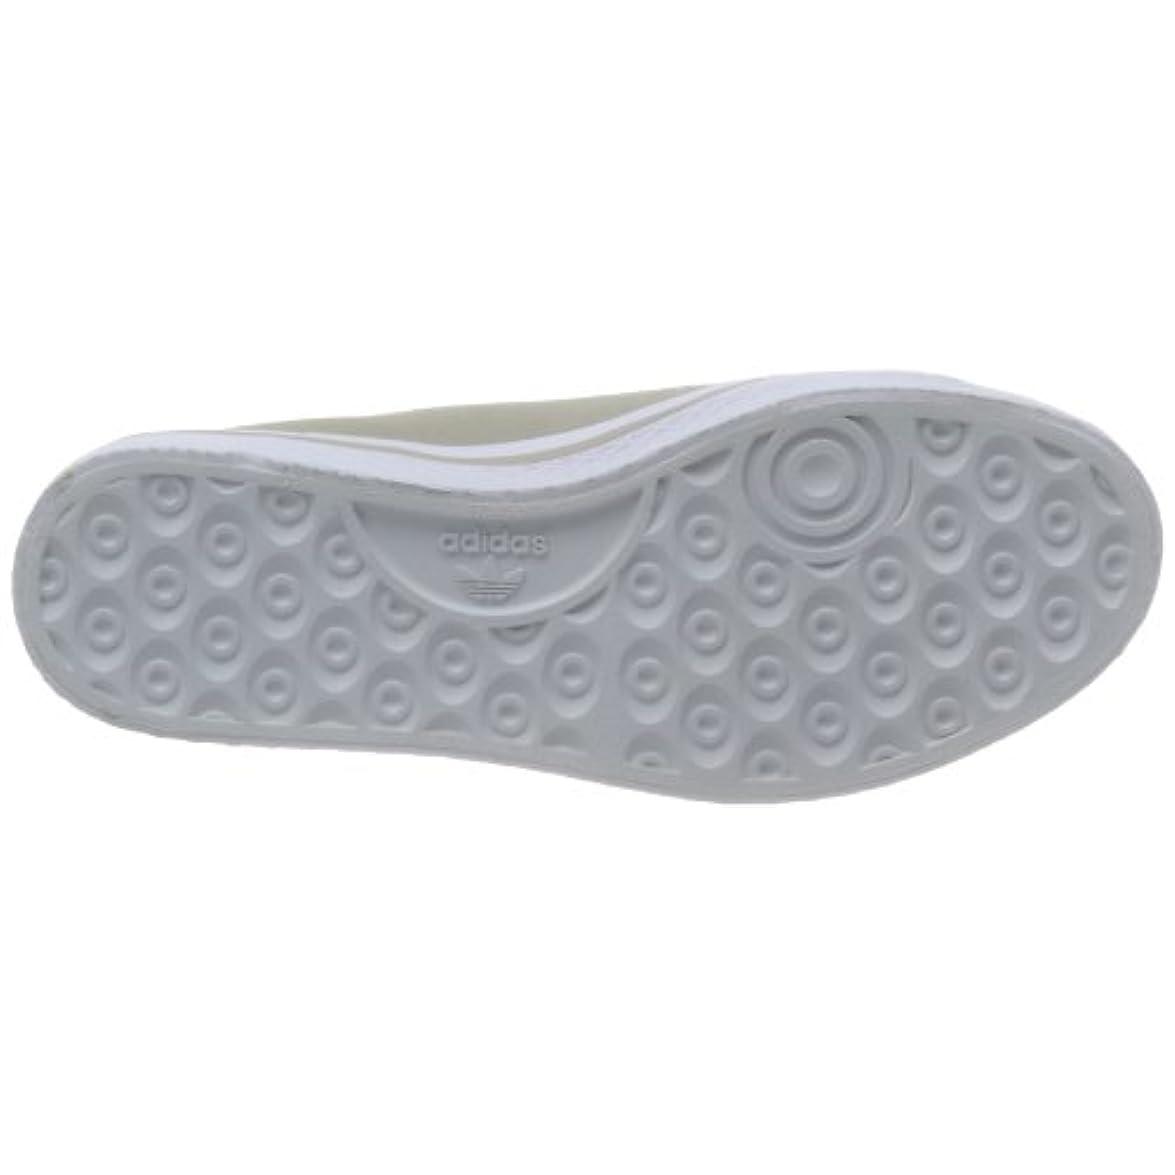 Adidas Sneaker Donna Multicolore Beige grey